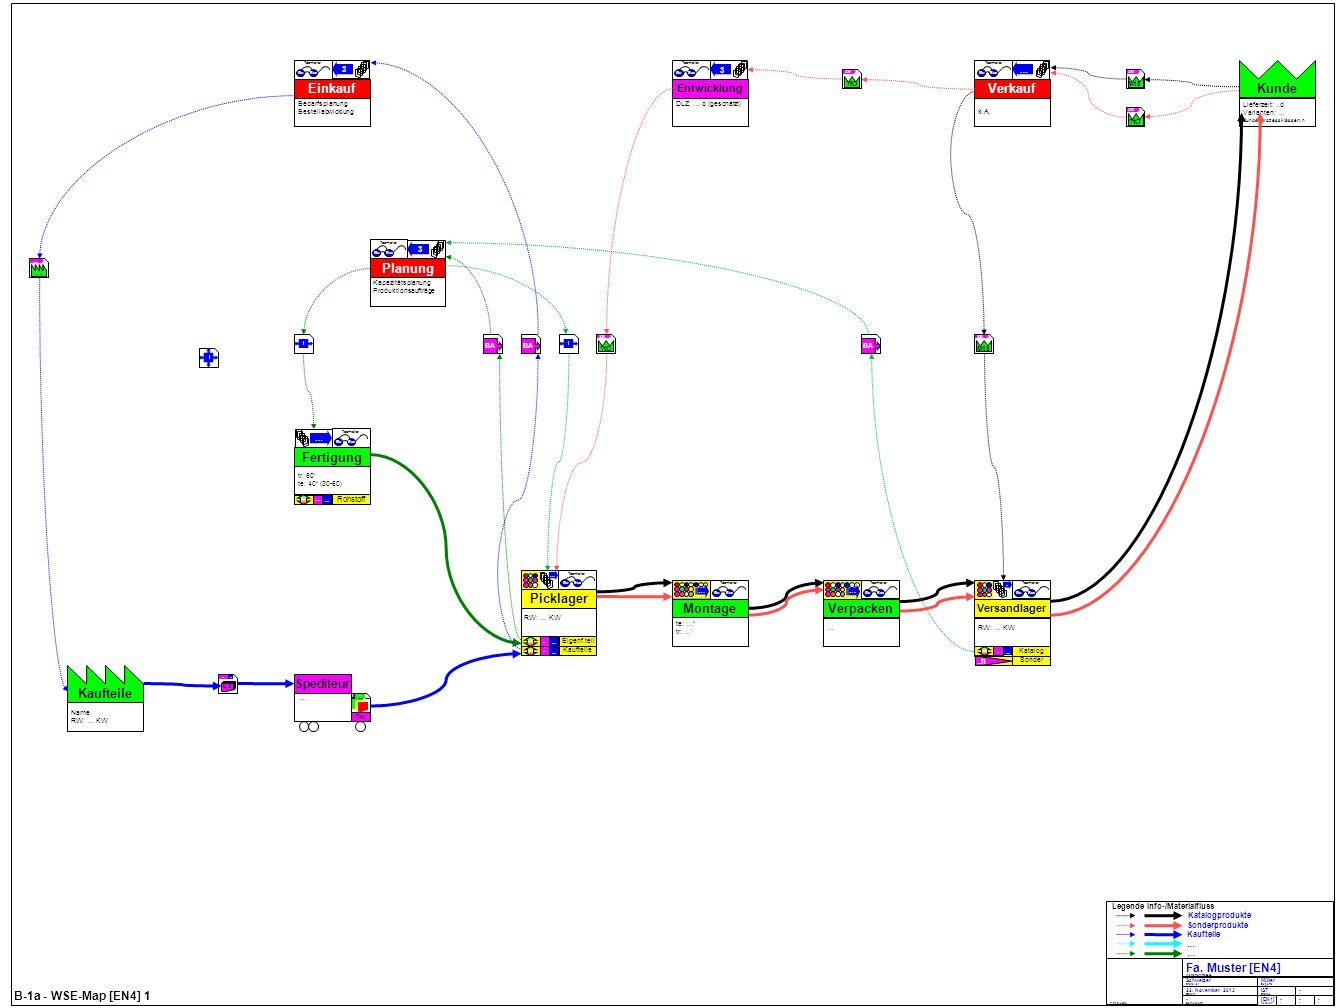 B-1a - WSE-Map [EN4] 1 Kunde Lieferzeit:..d Varianten: … Kundenprozessklassen: n Kaufteile Name RW: … KW Tag …. Spediteur 4 - BA I Montage te: … tr: …